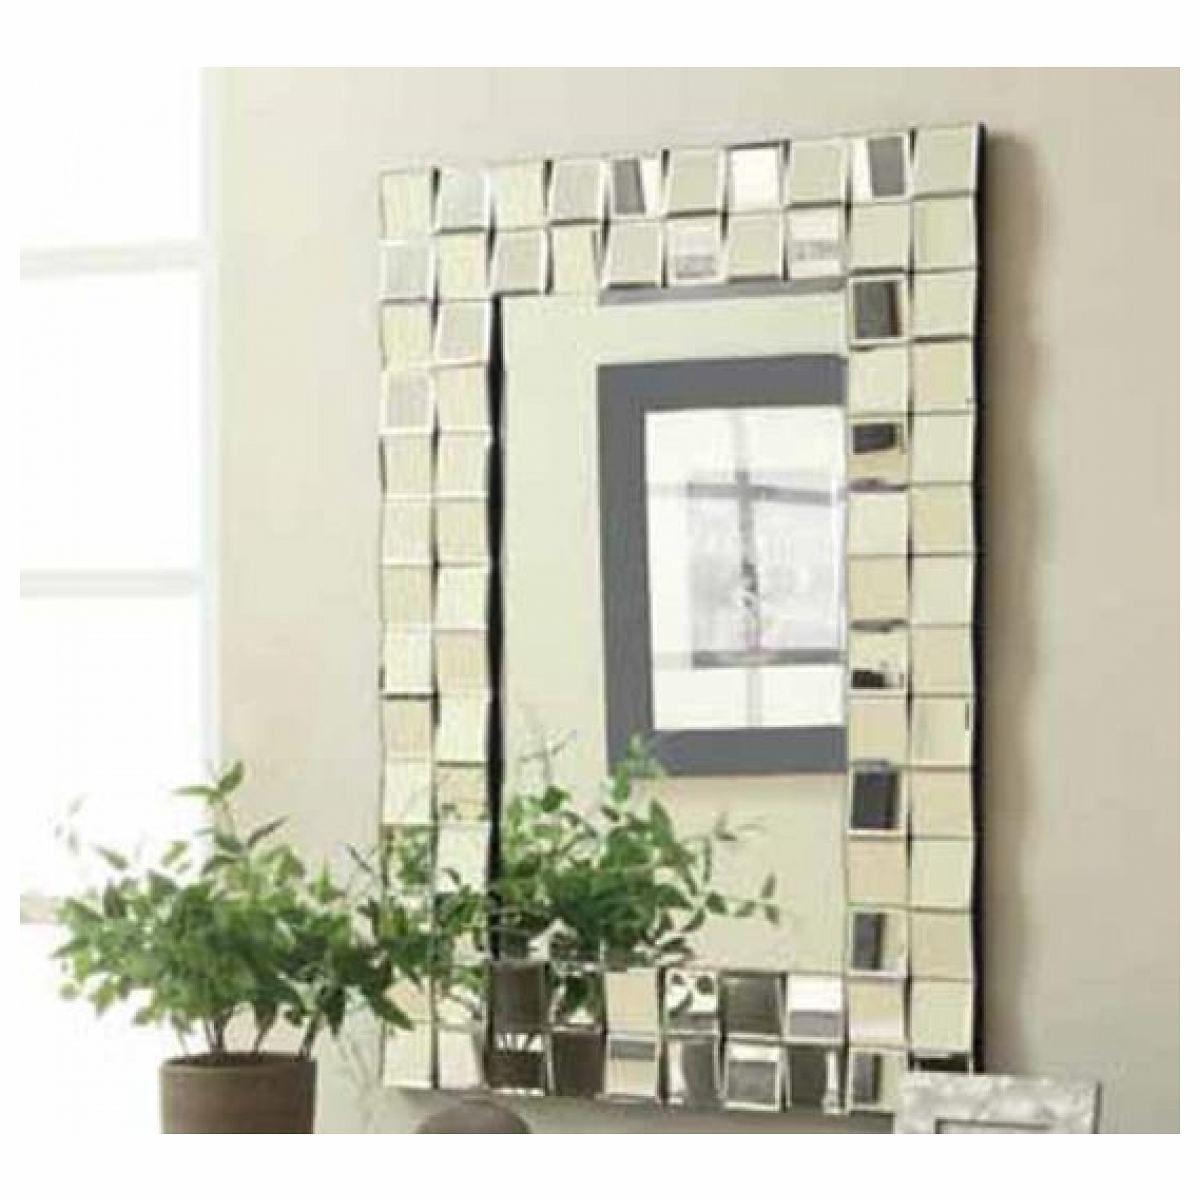 For Sale Checkered Zigzag Outer Edge Framed Rectangular Design Frameless Decorative Wall Mirror Mirror Wall Living Room Modern Mirror Wall Mirror Design Wall #rectangle #mirrors #for #living #room